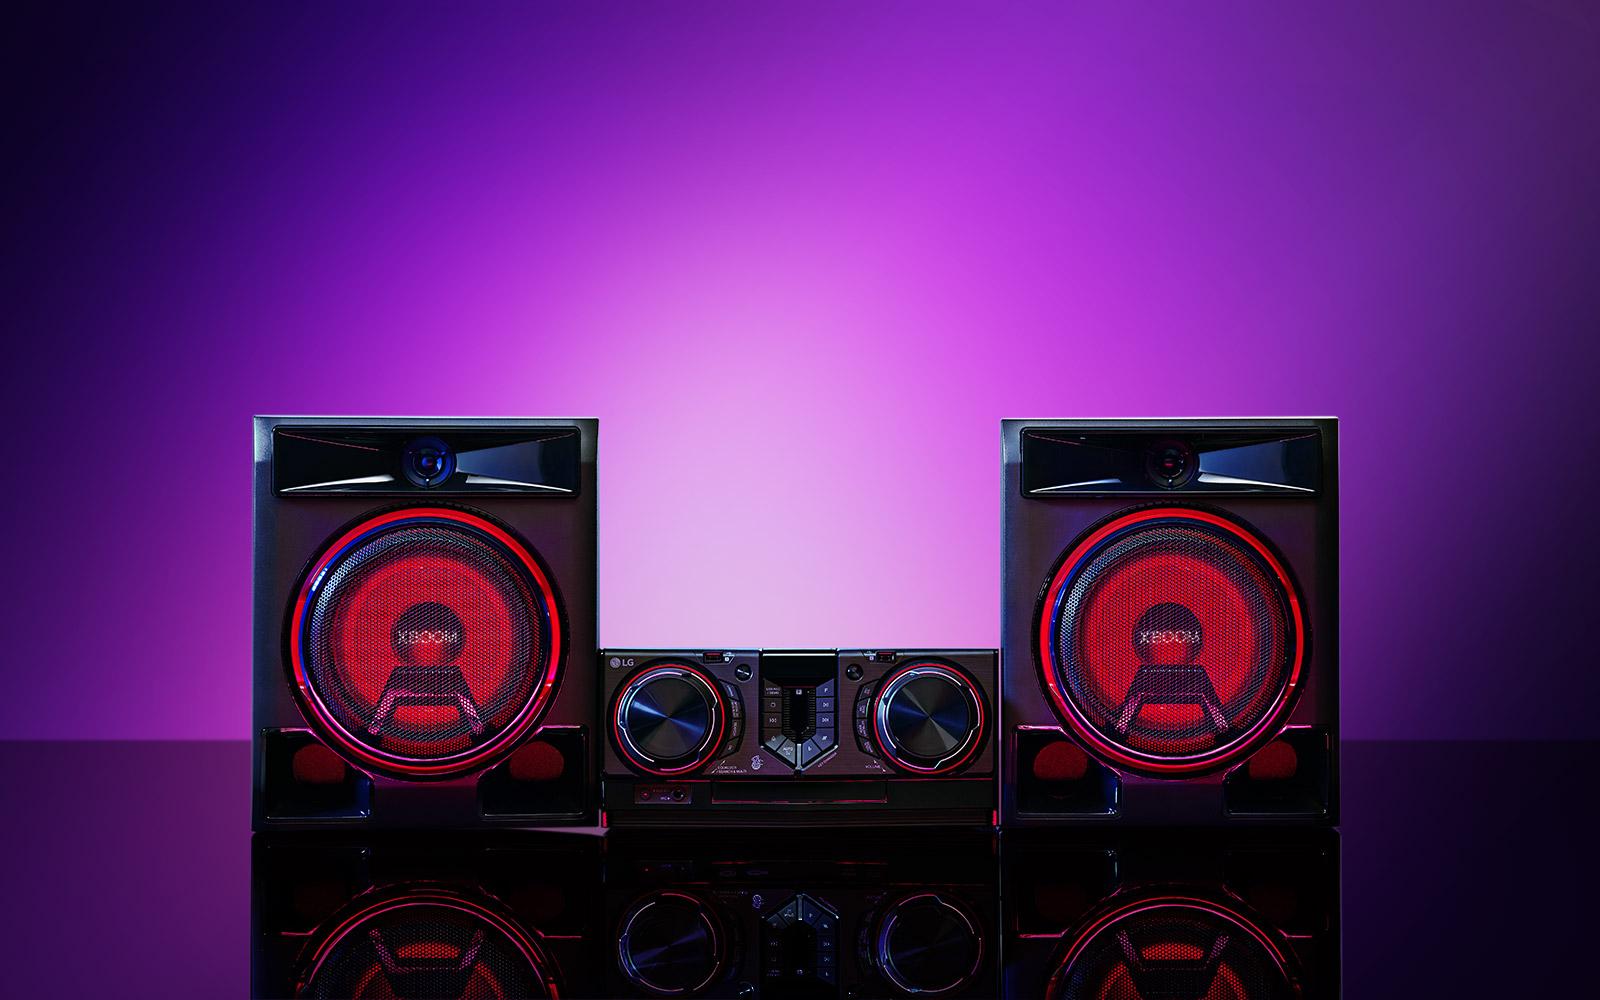 Powerful 950-Watt Sound